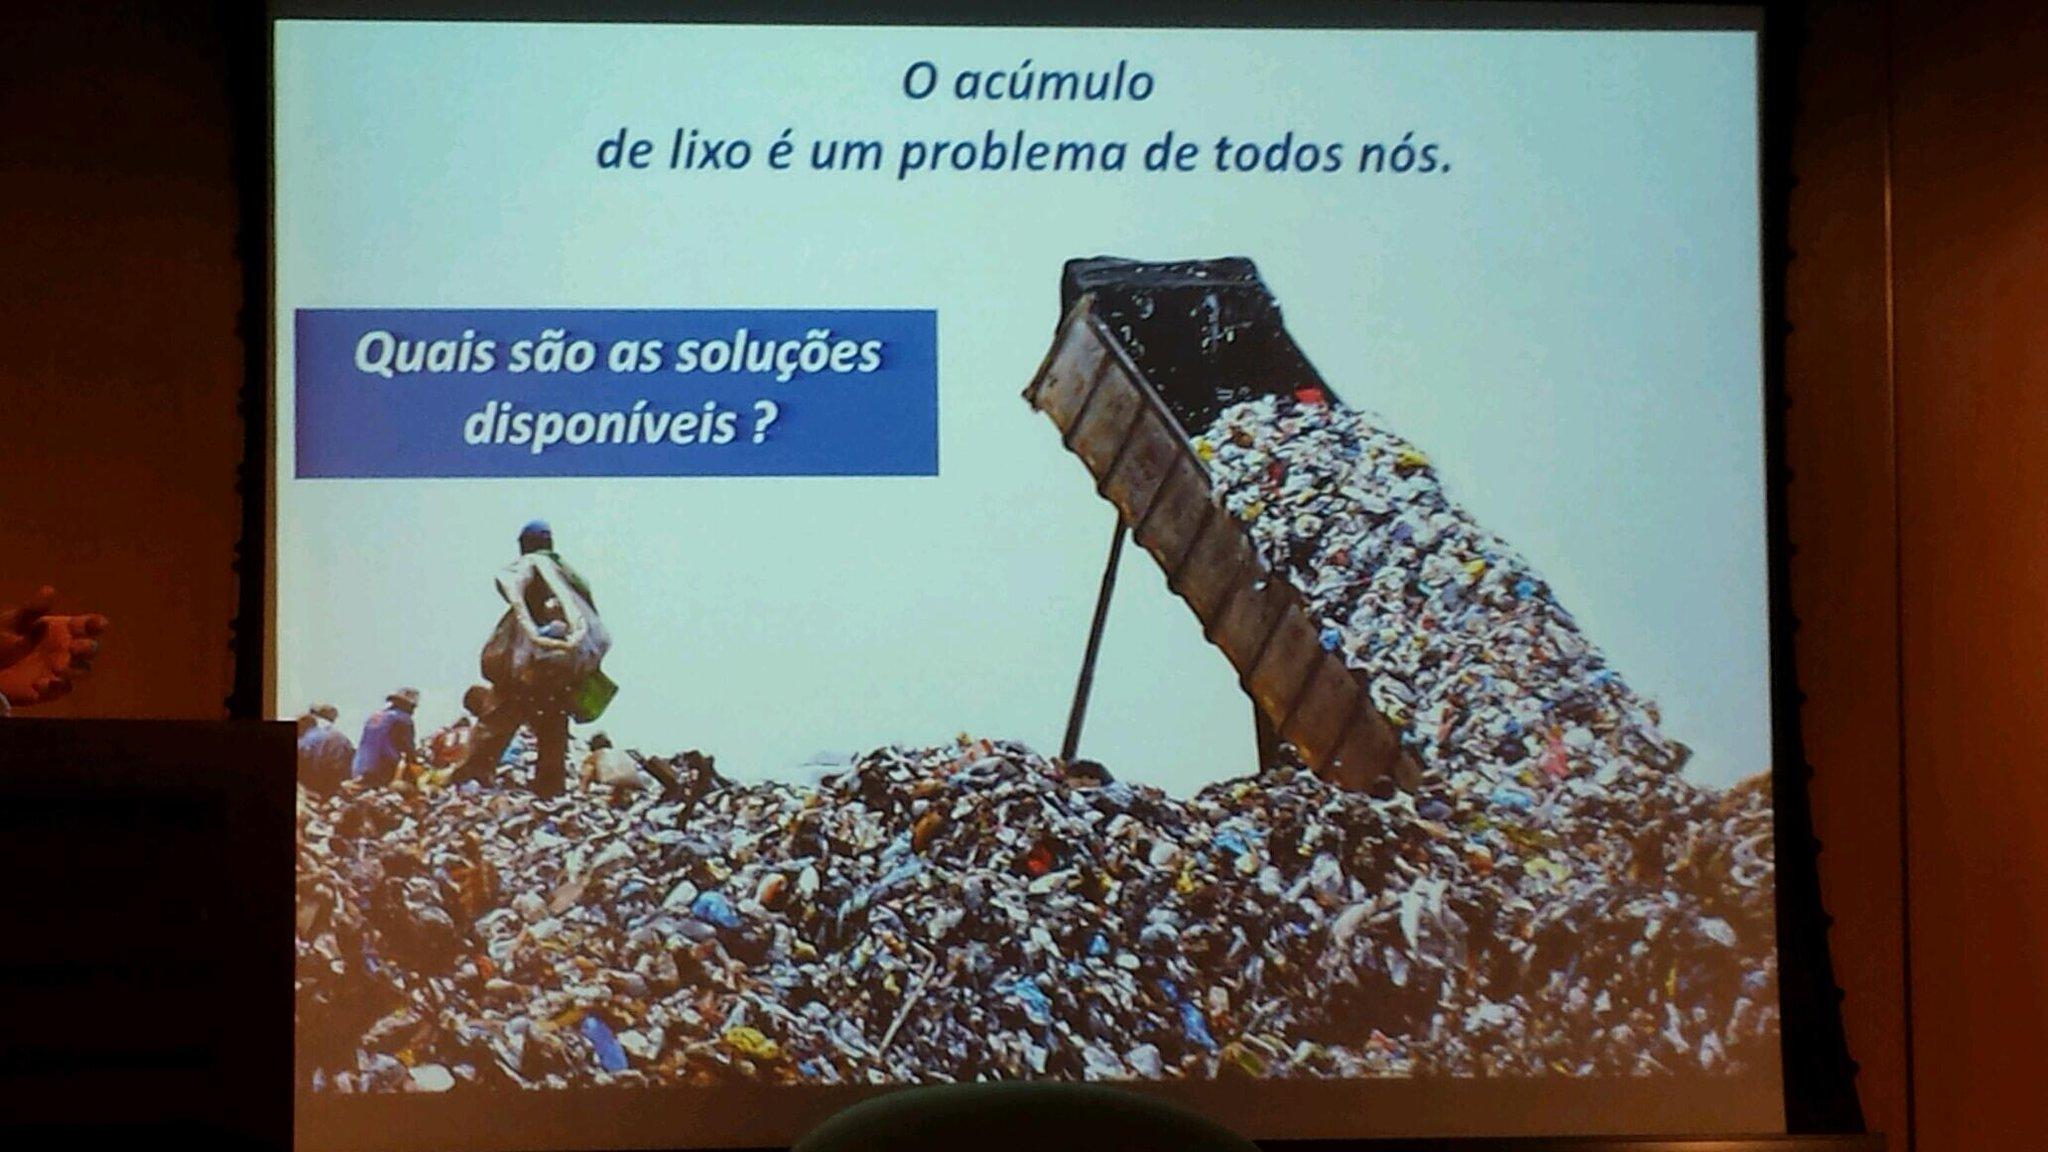 Unregulated landfill is unacceptable